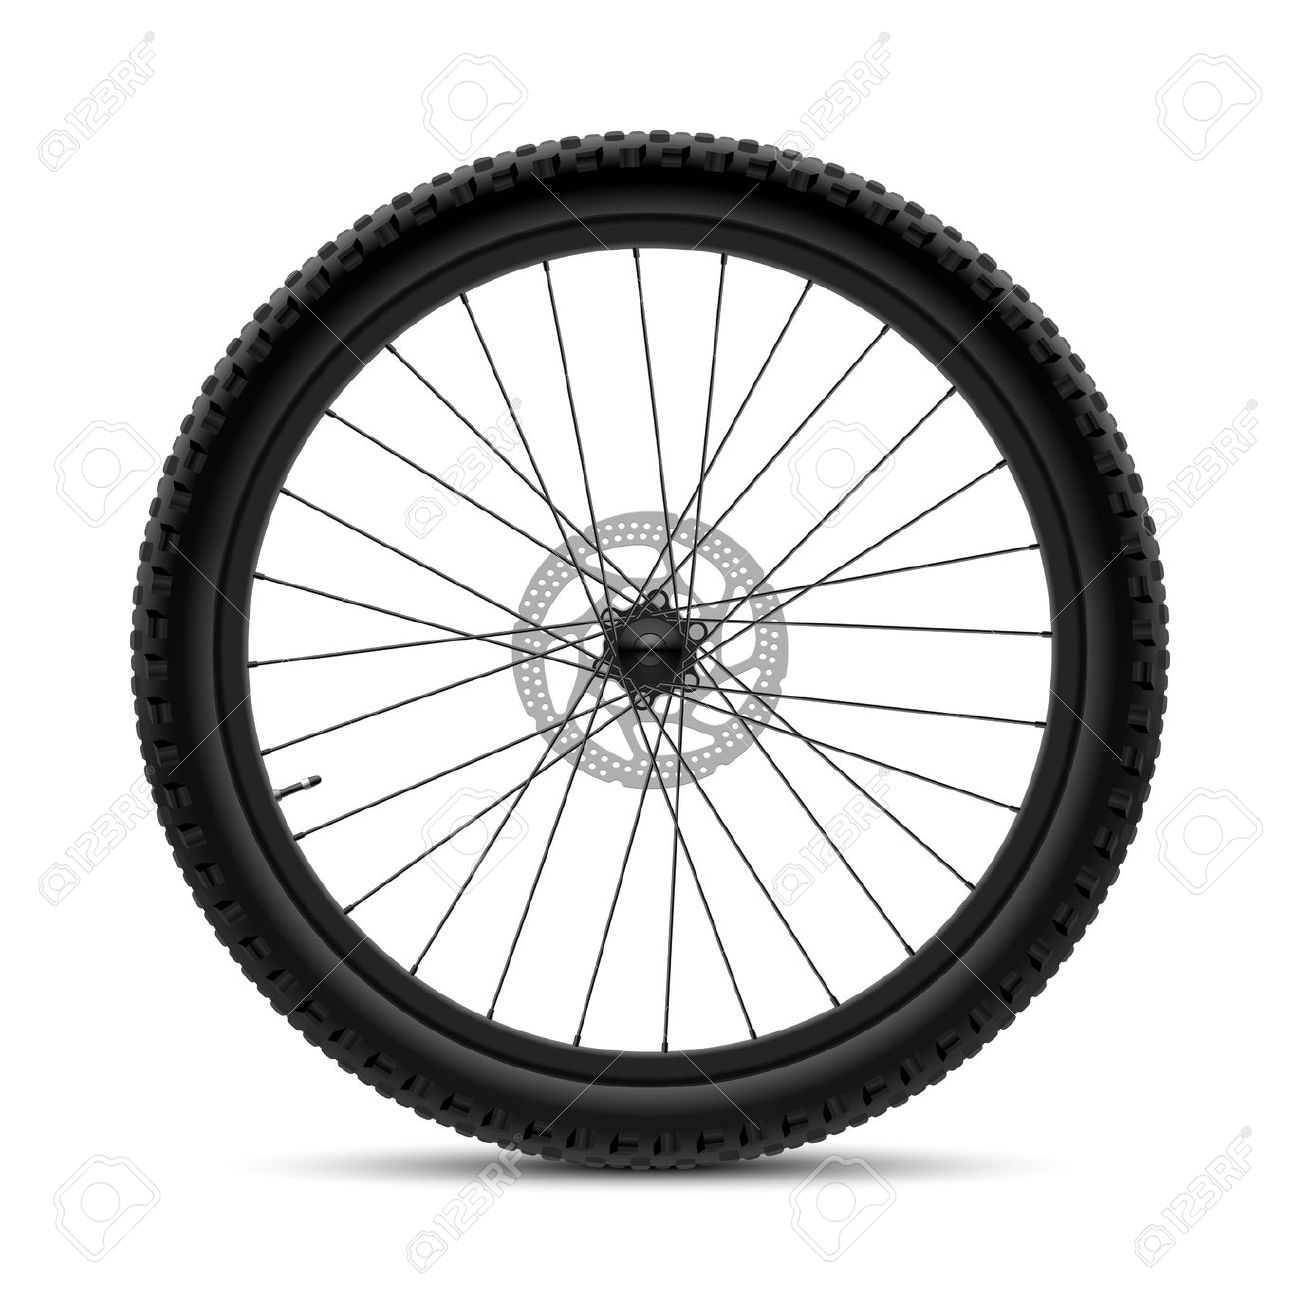 Coker tire clipart.